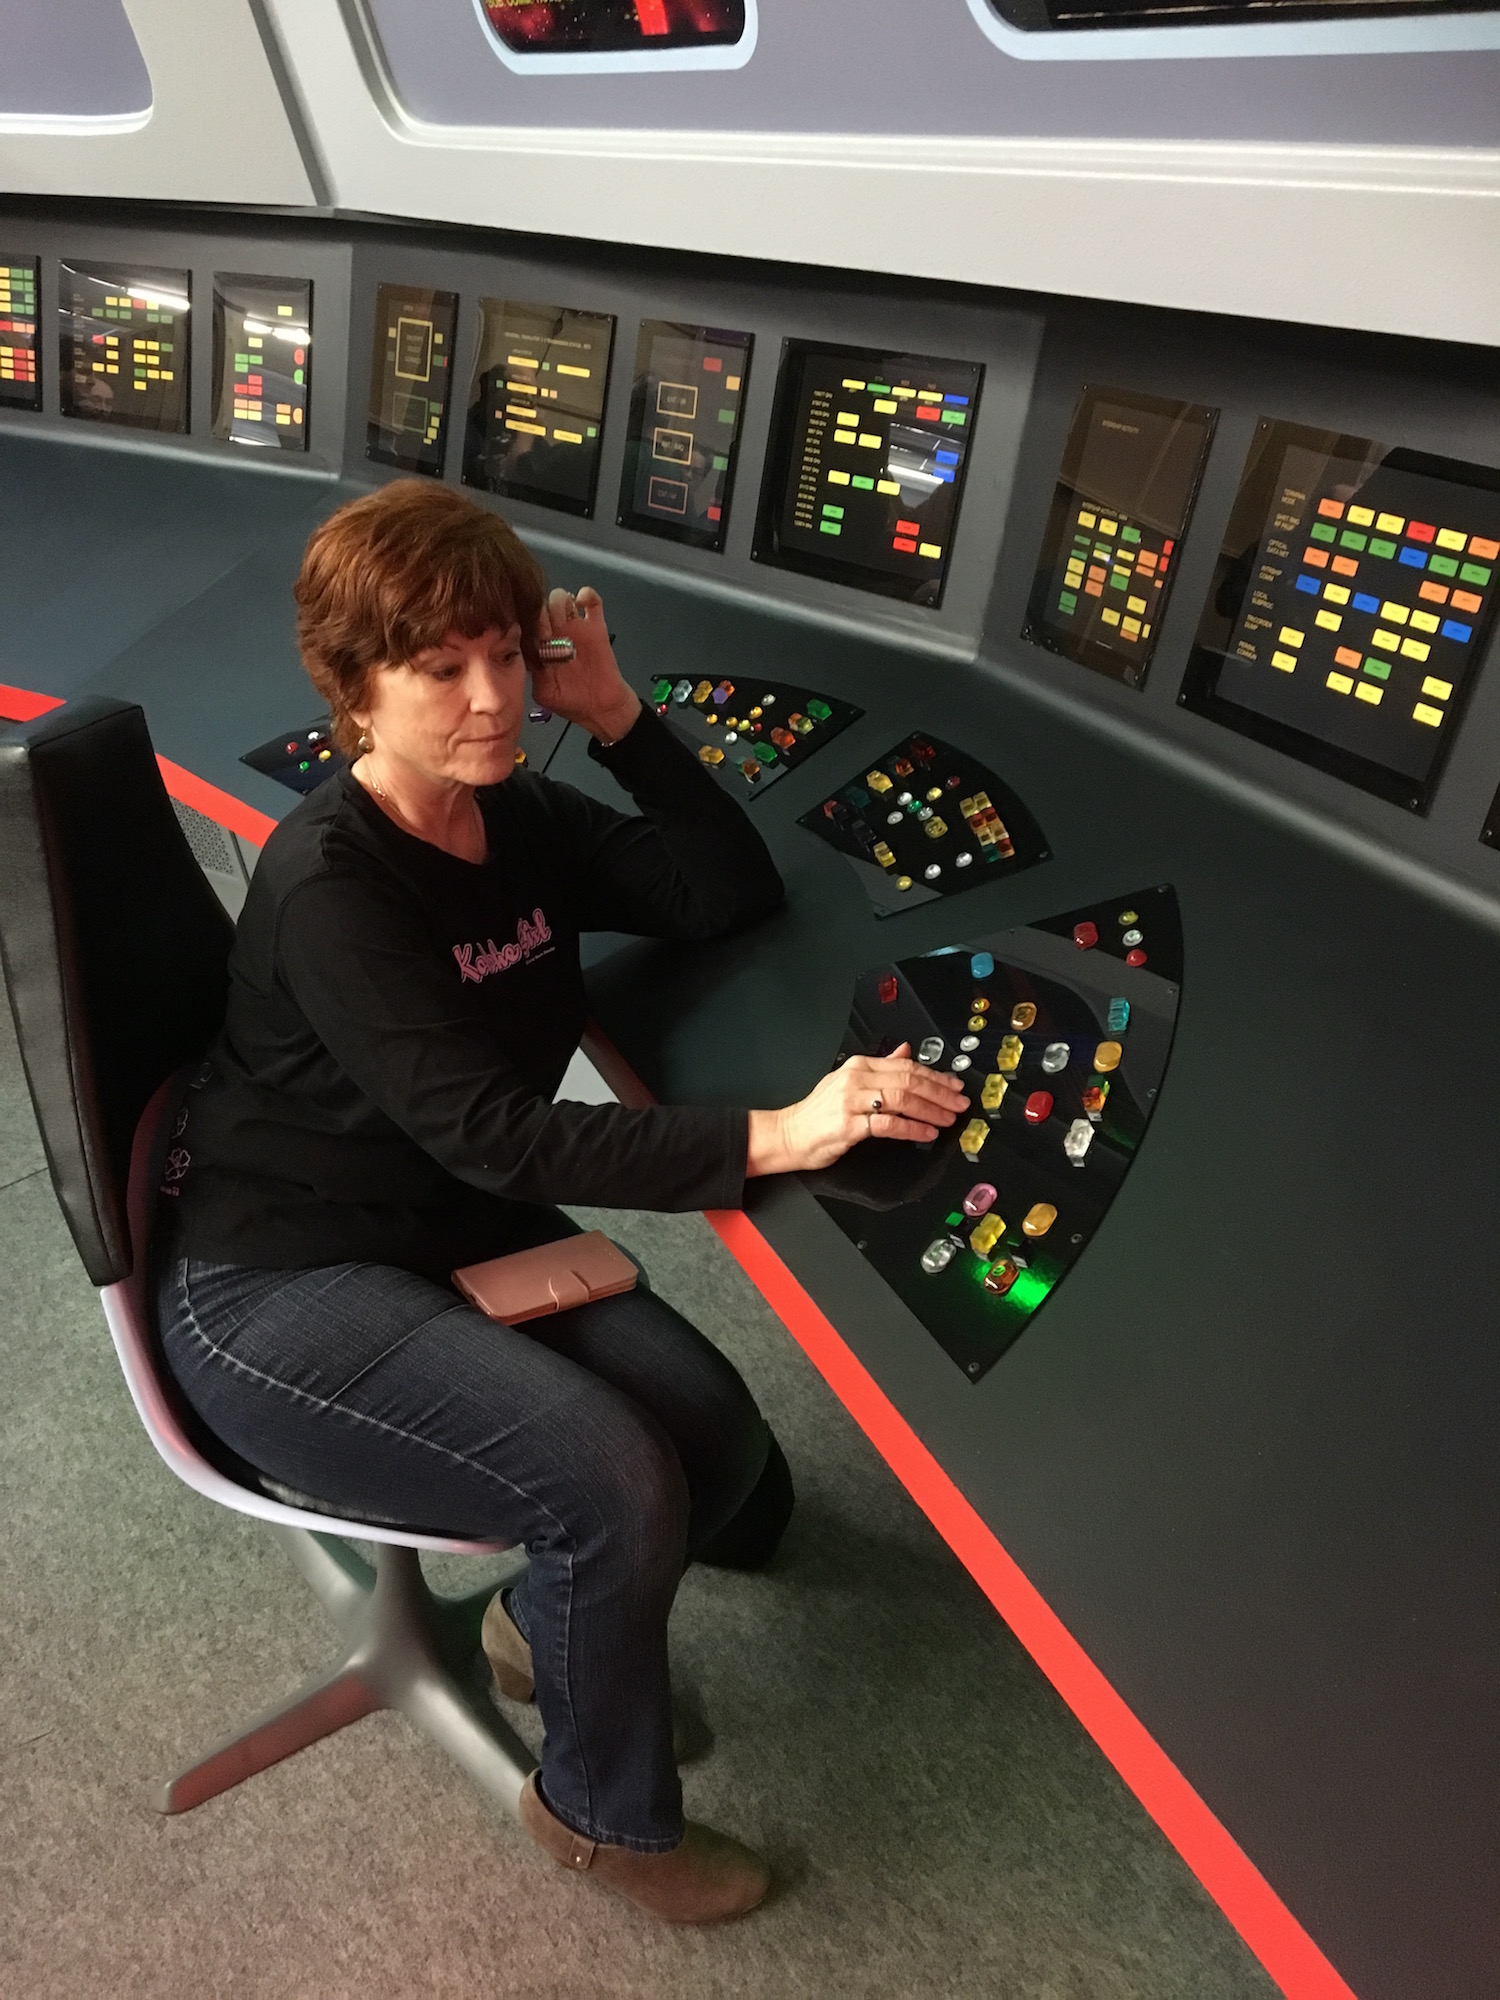 Karen Ragan-George at the Communications Station ©2017 David R. George III